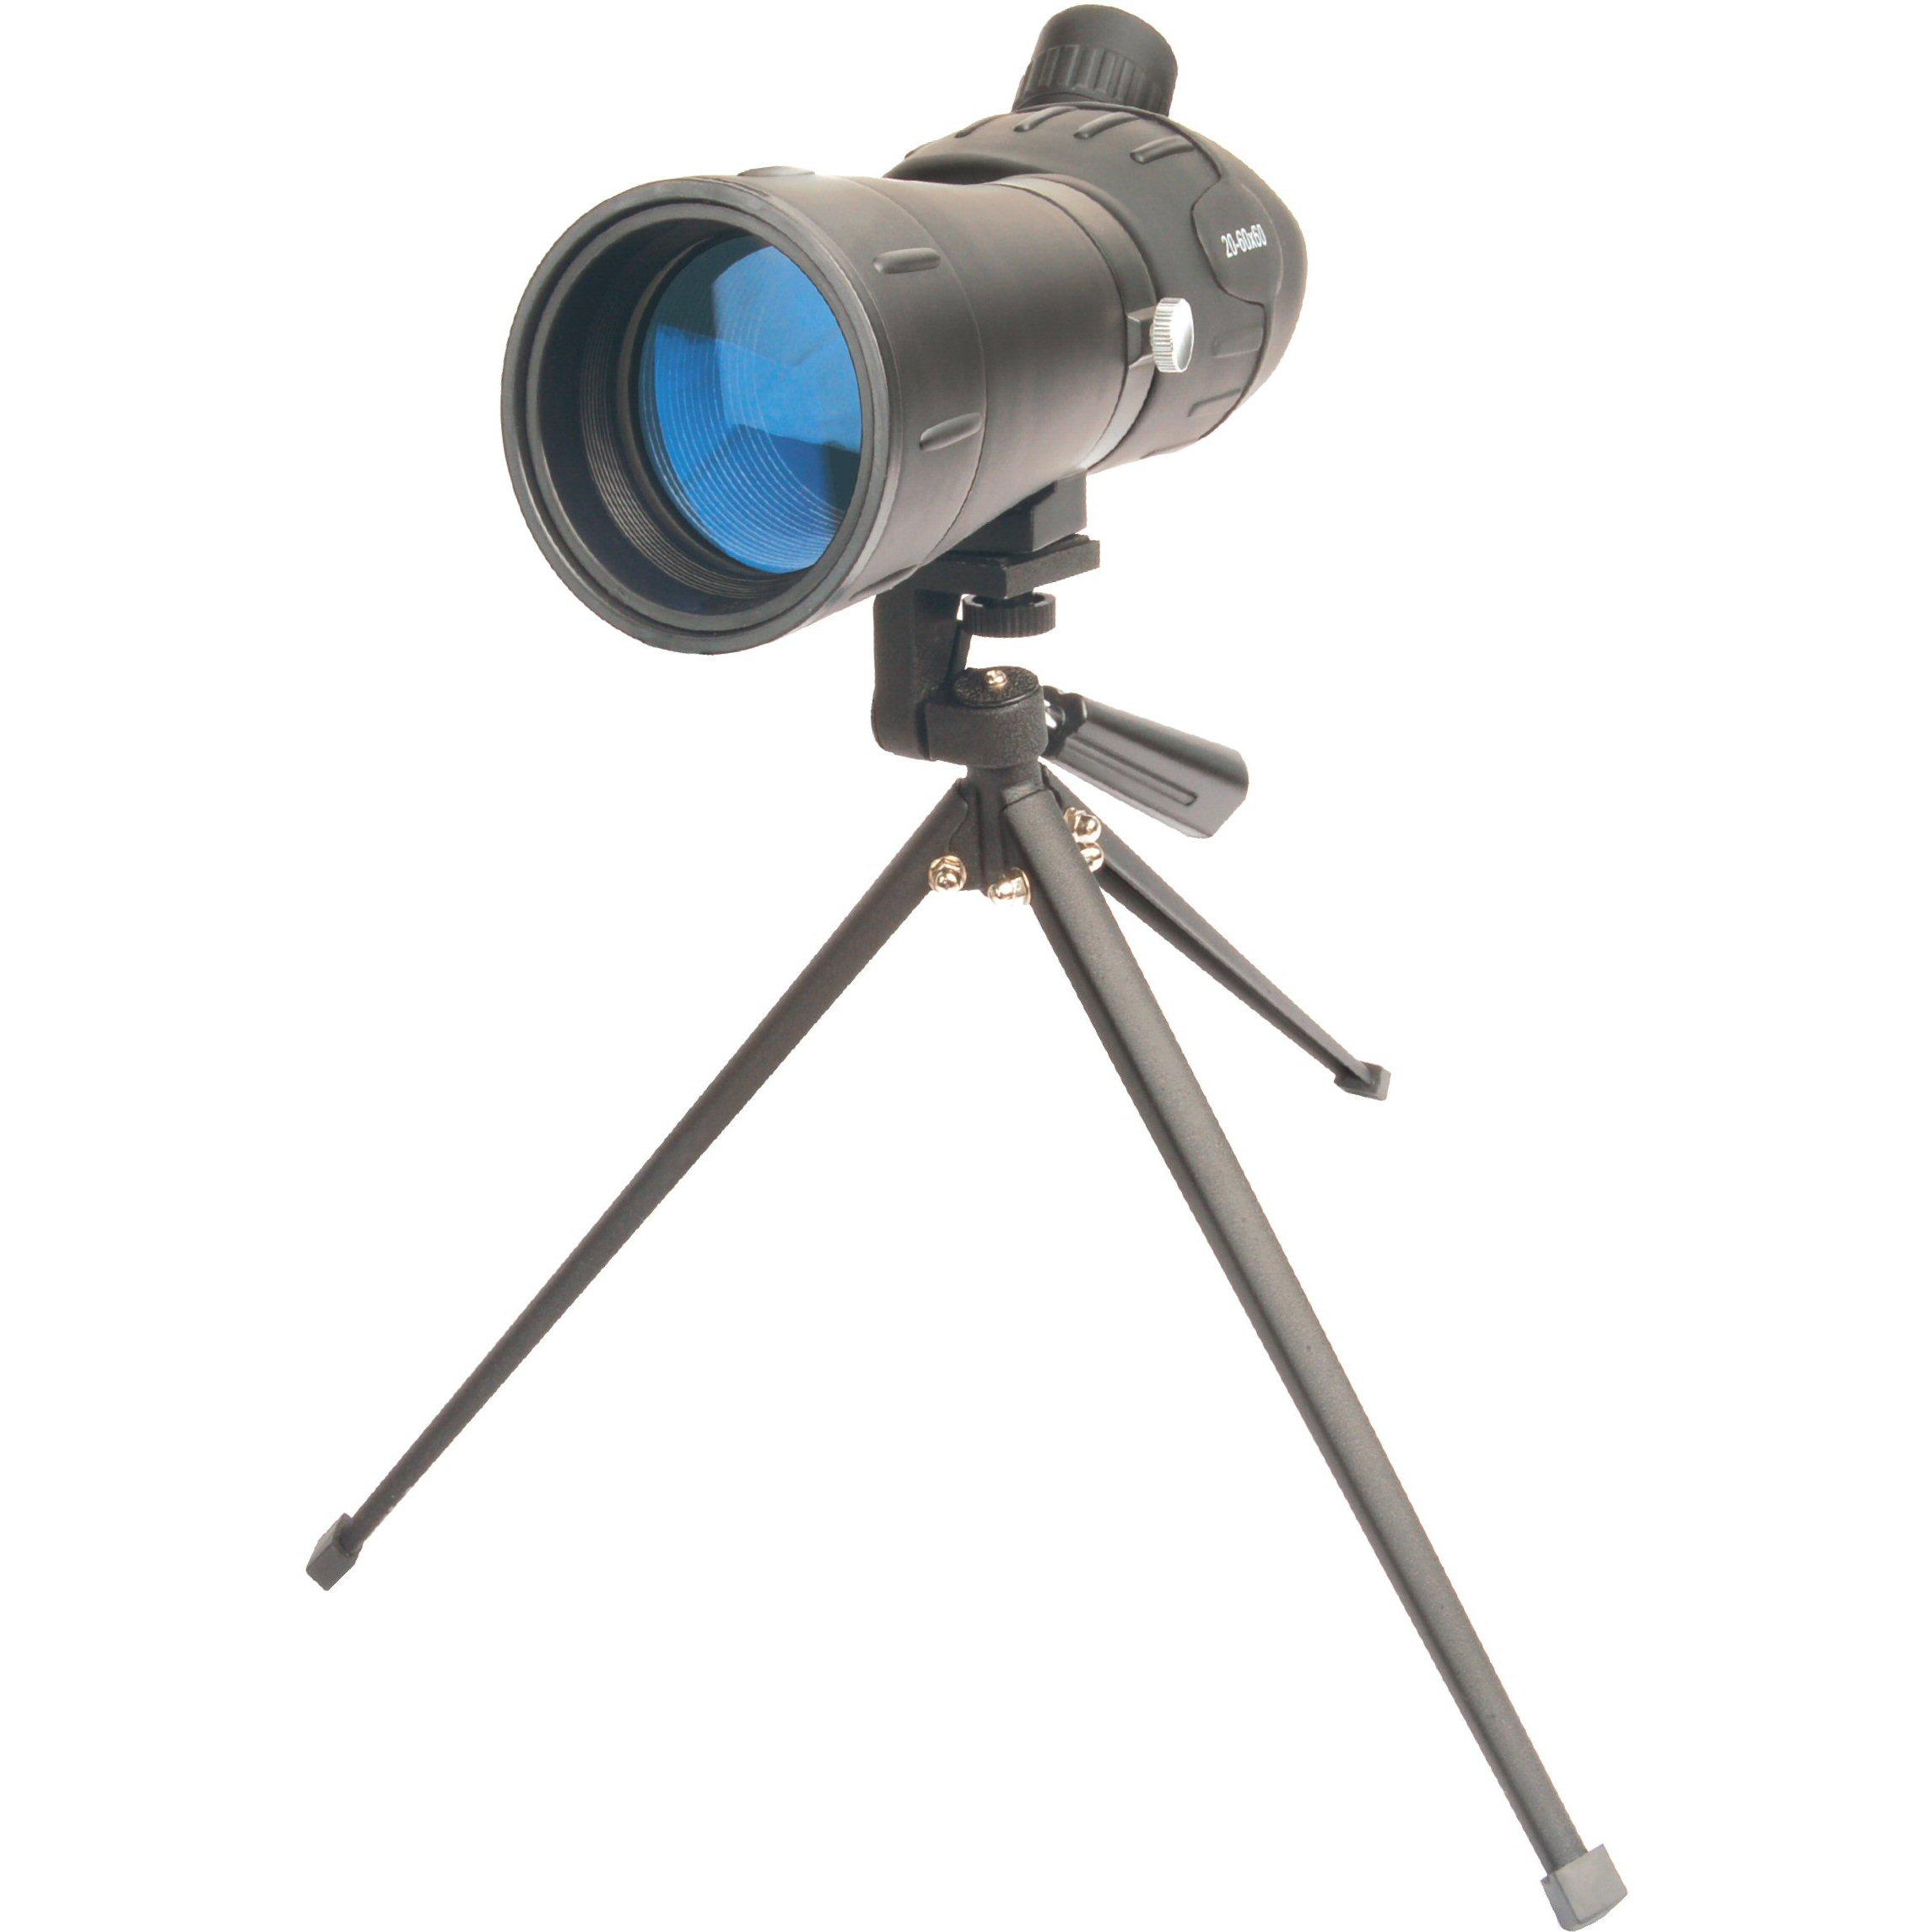 Topic - Jason 400X telescope - OpticsPlanet Forums - Reviews